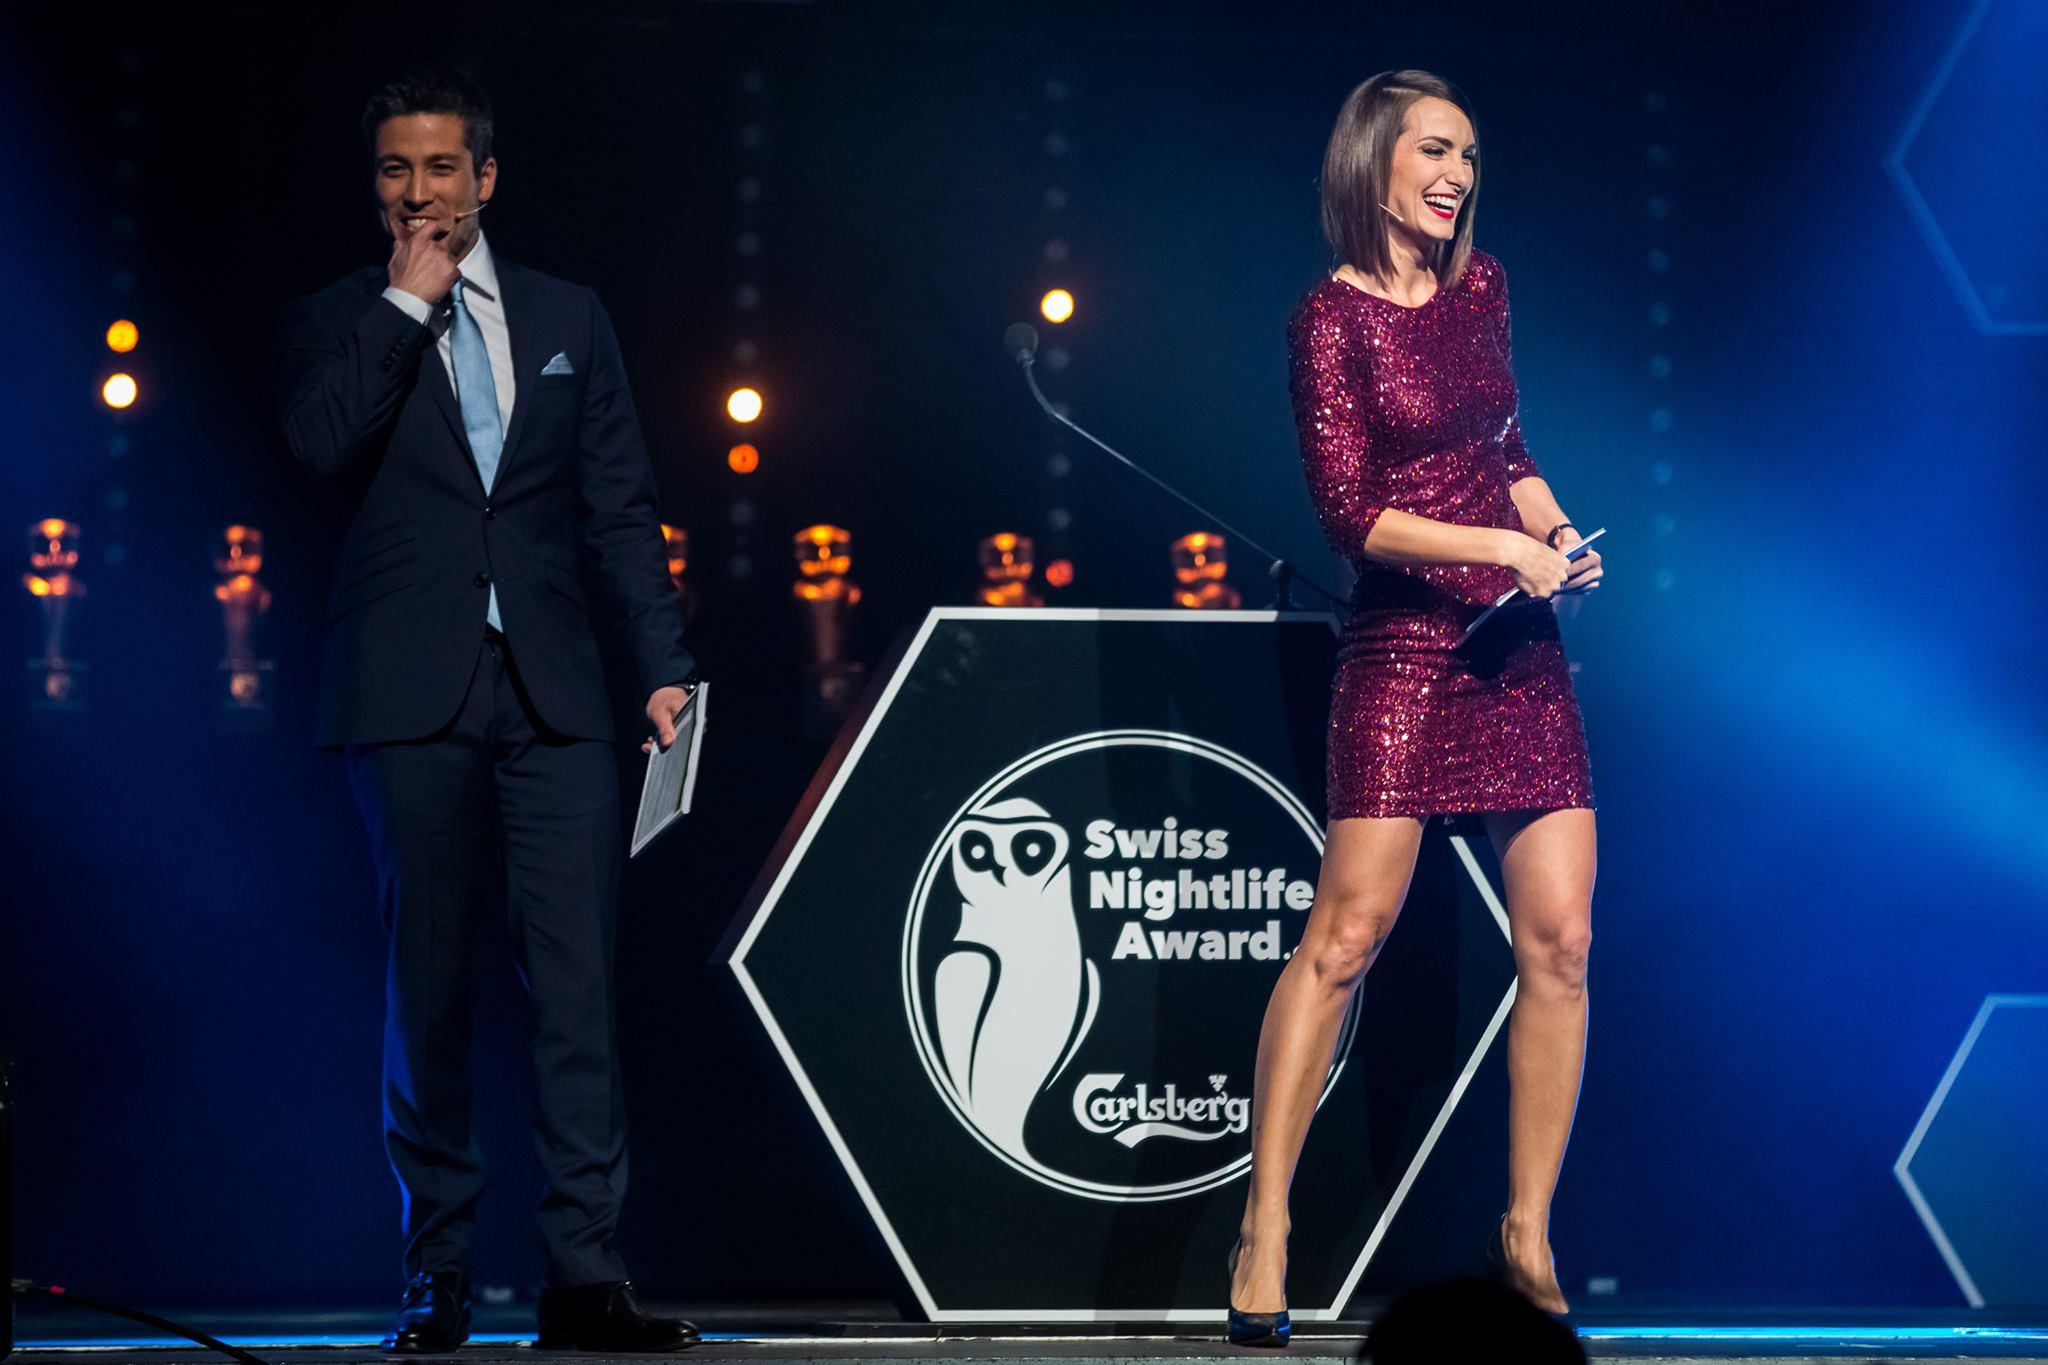 Swiss Night Life Award